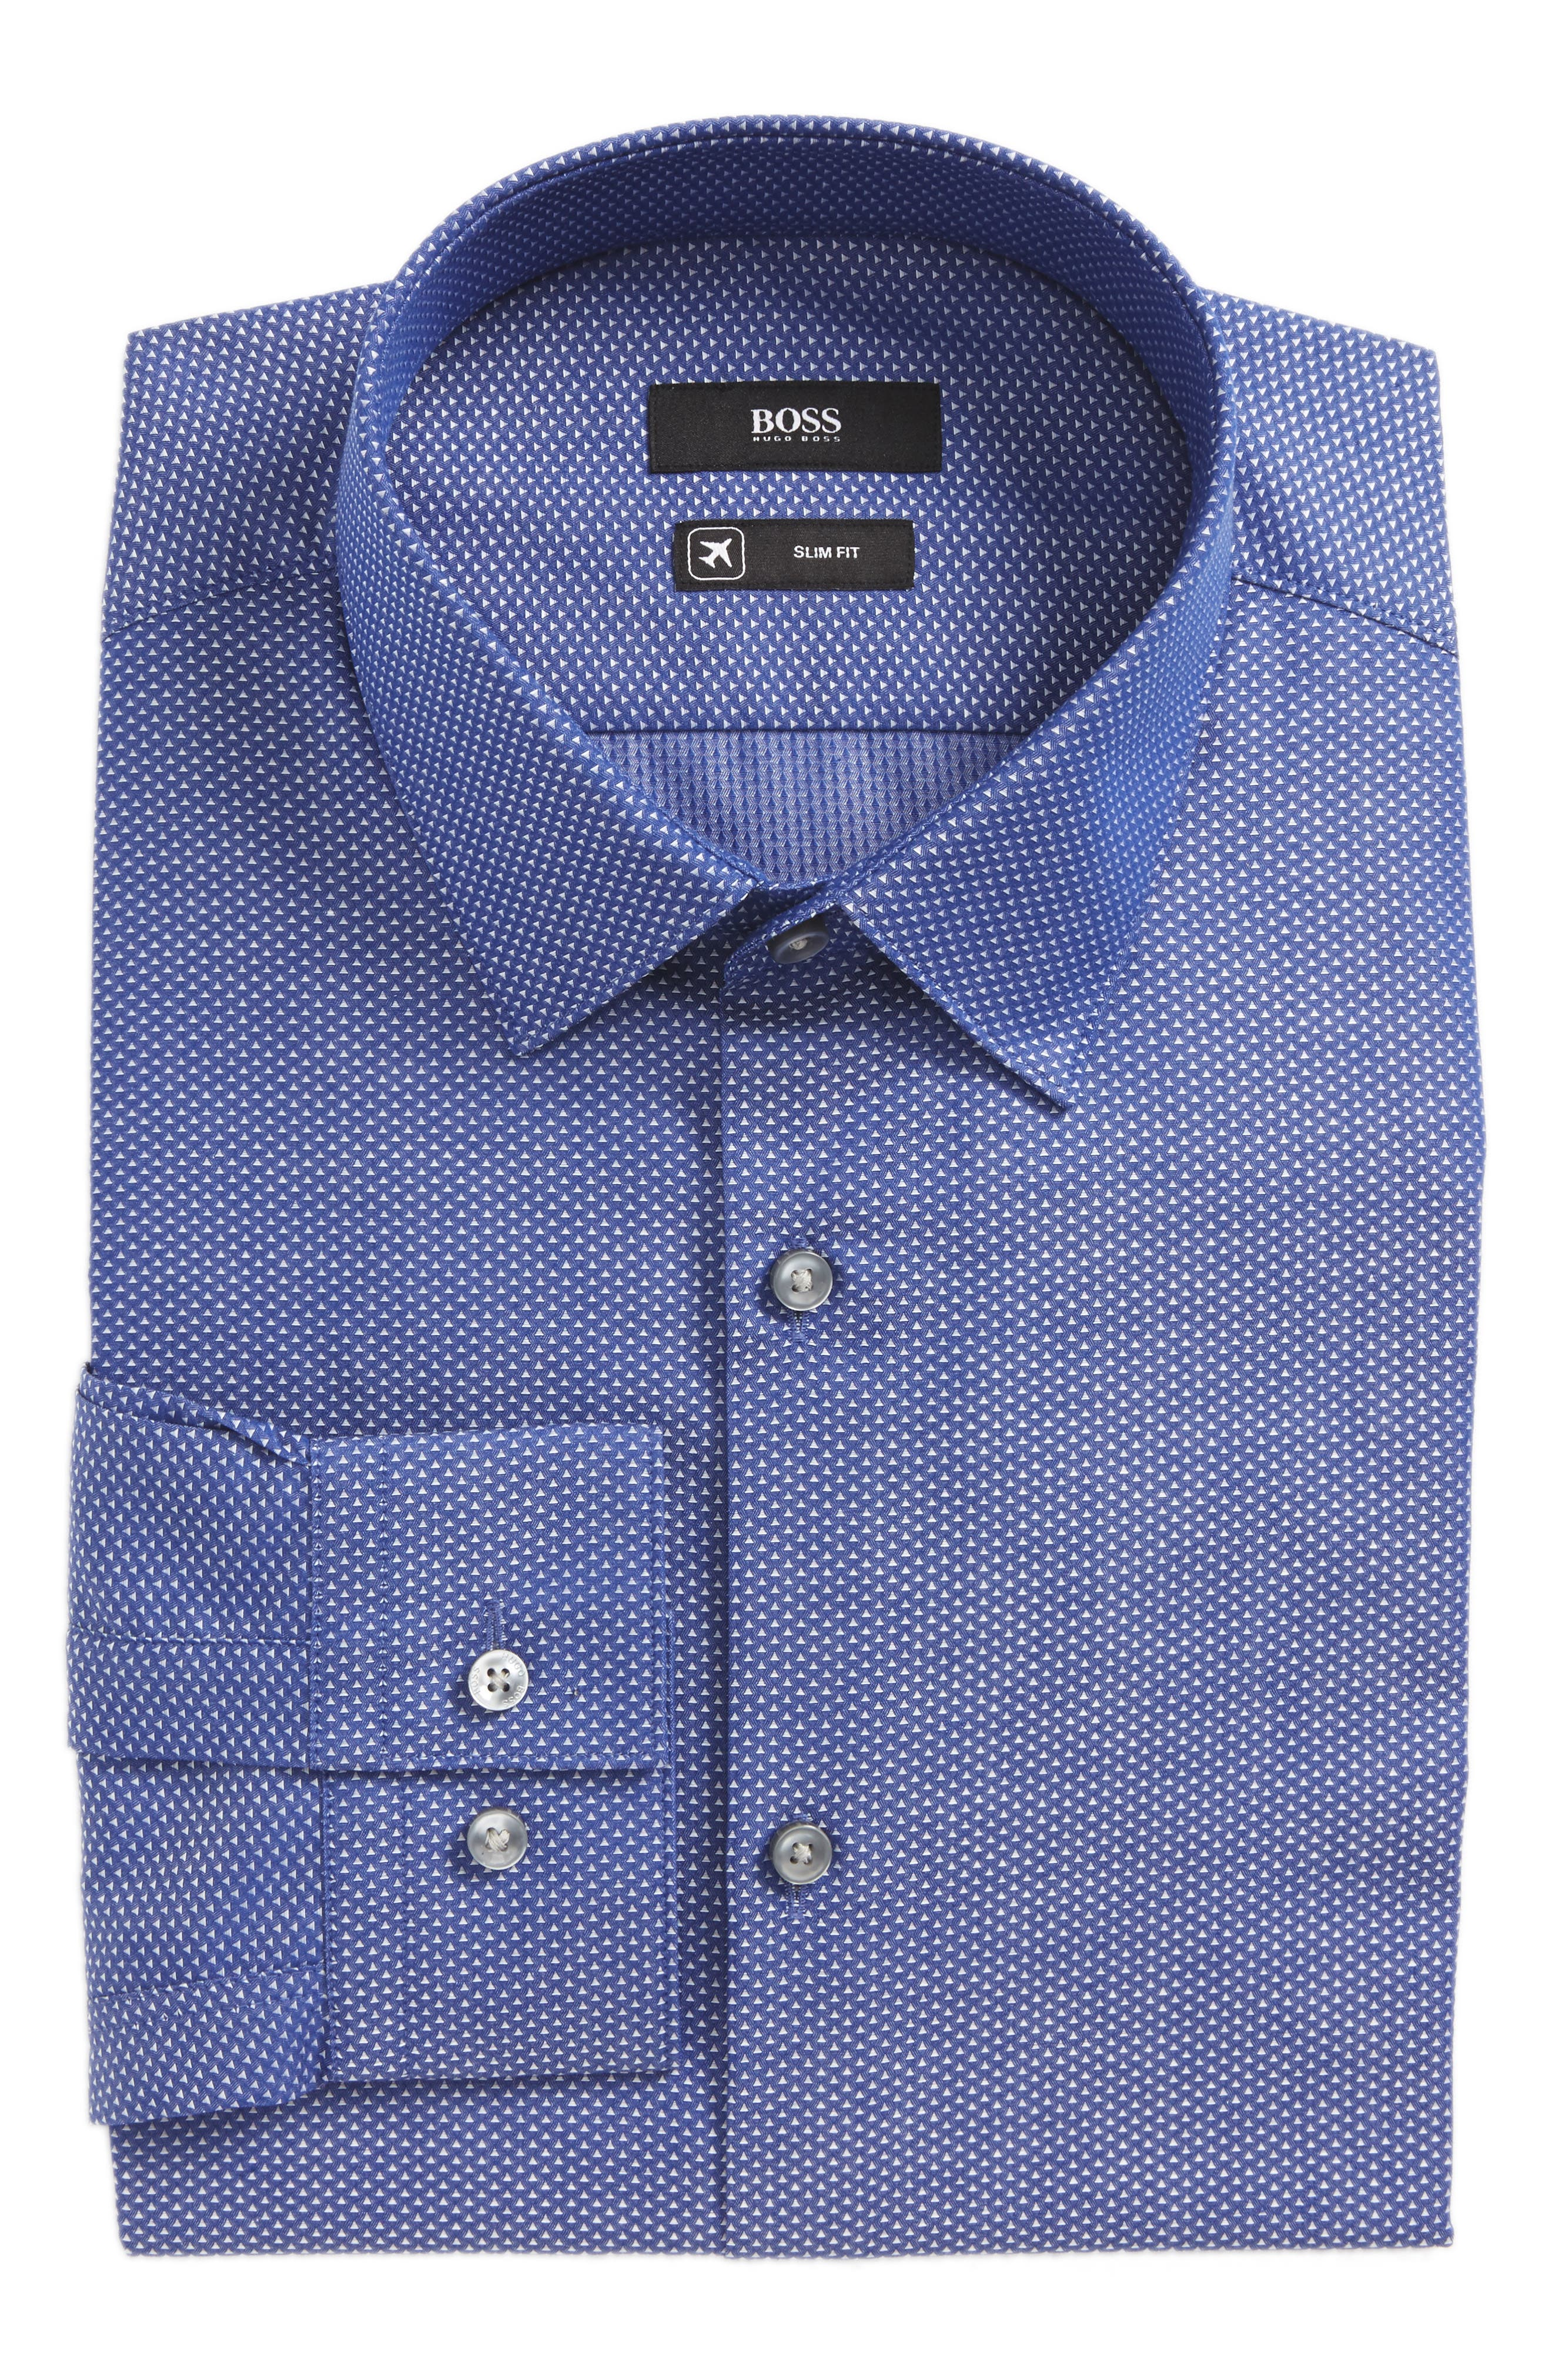 Main Image - BOSS Isko Slim Fit Geometric Dress Shirt